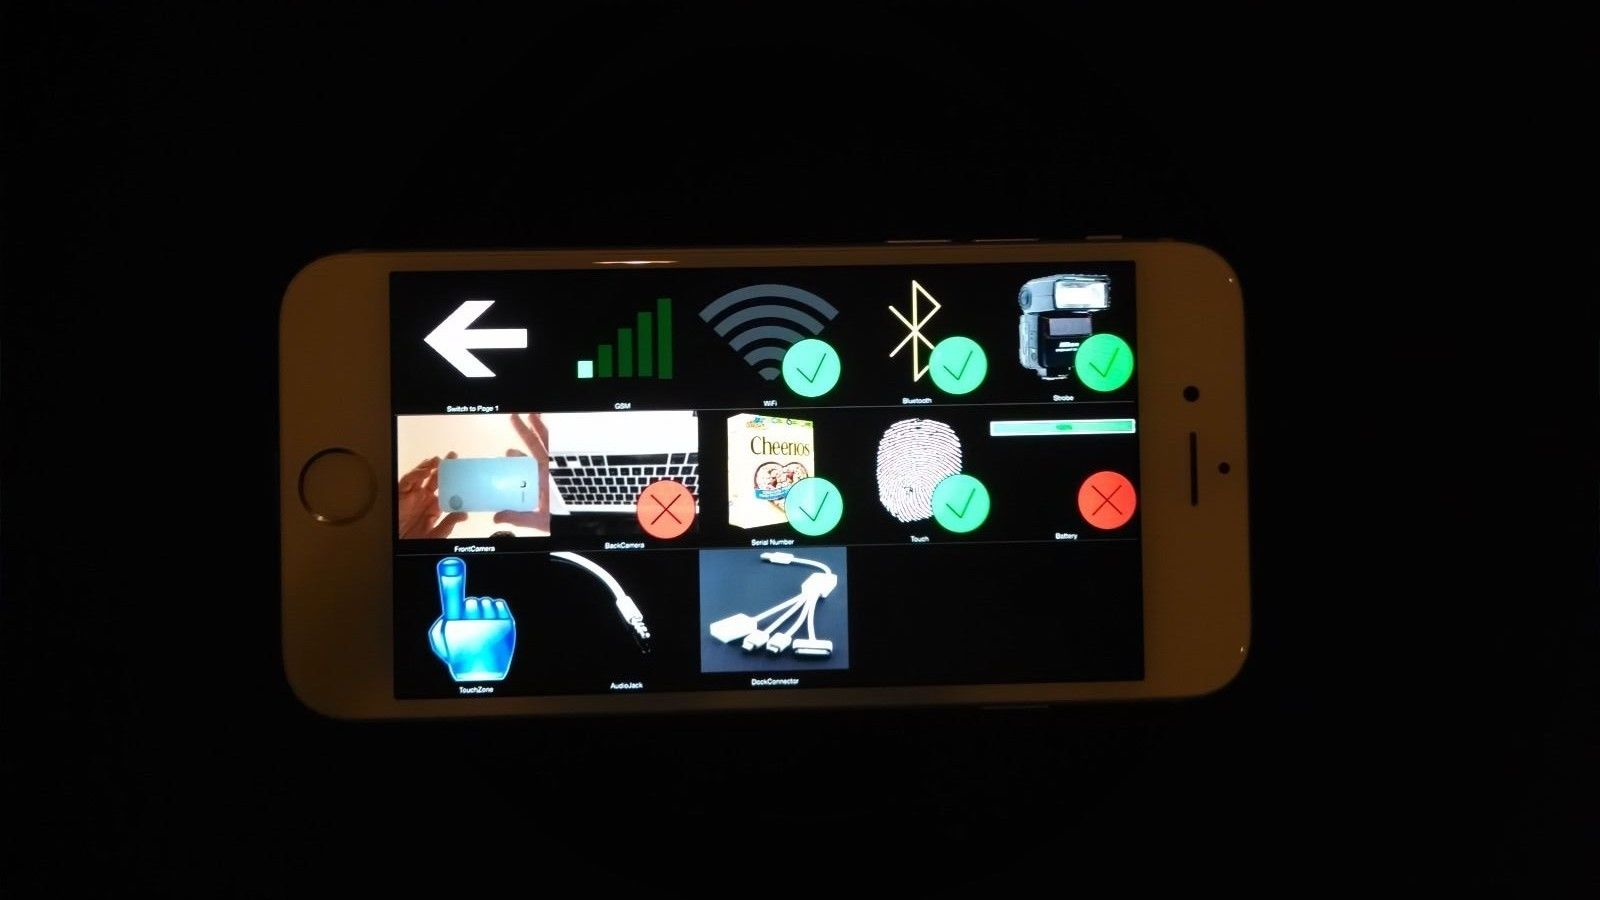 iphone-6-no-ebay-chega-a-brl-143mil-05